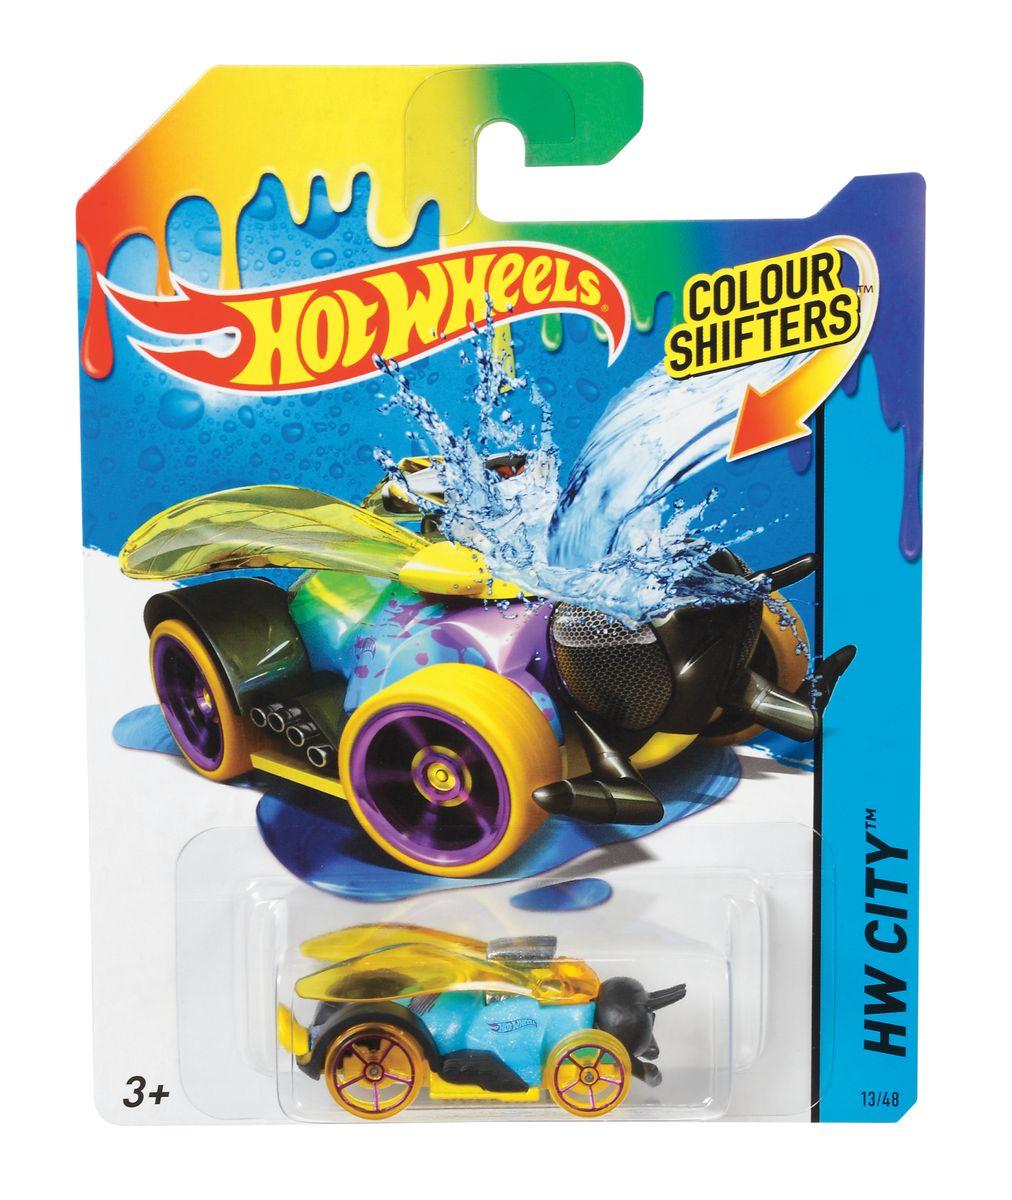 Hot Wheels Машинка, меняющая цвет Color shifters hot wheels машинки меняющие цвет color shifters fire eater